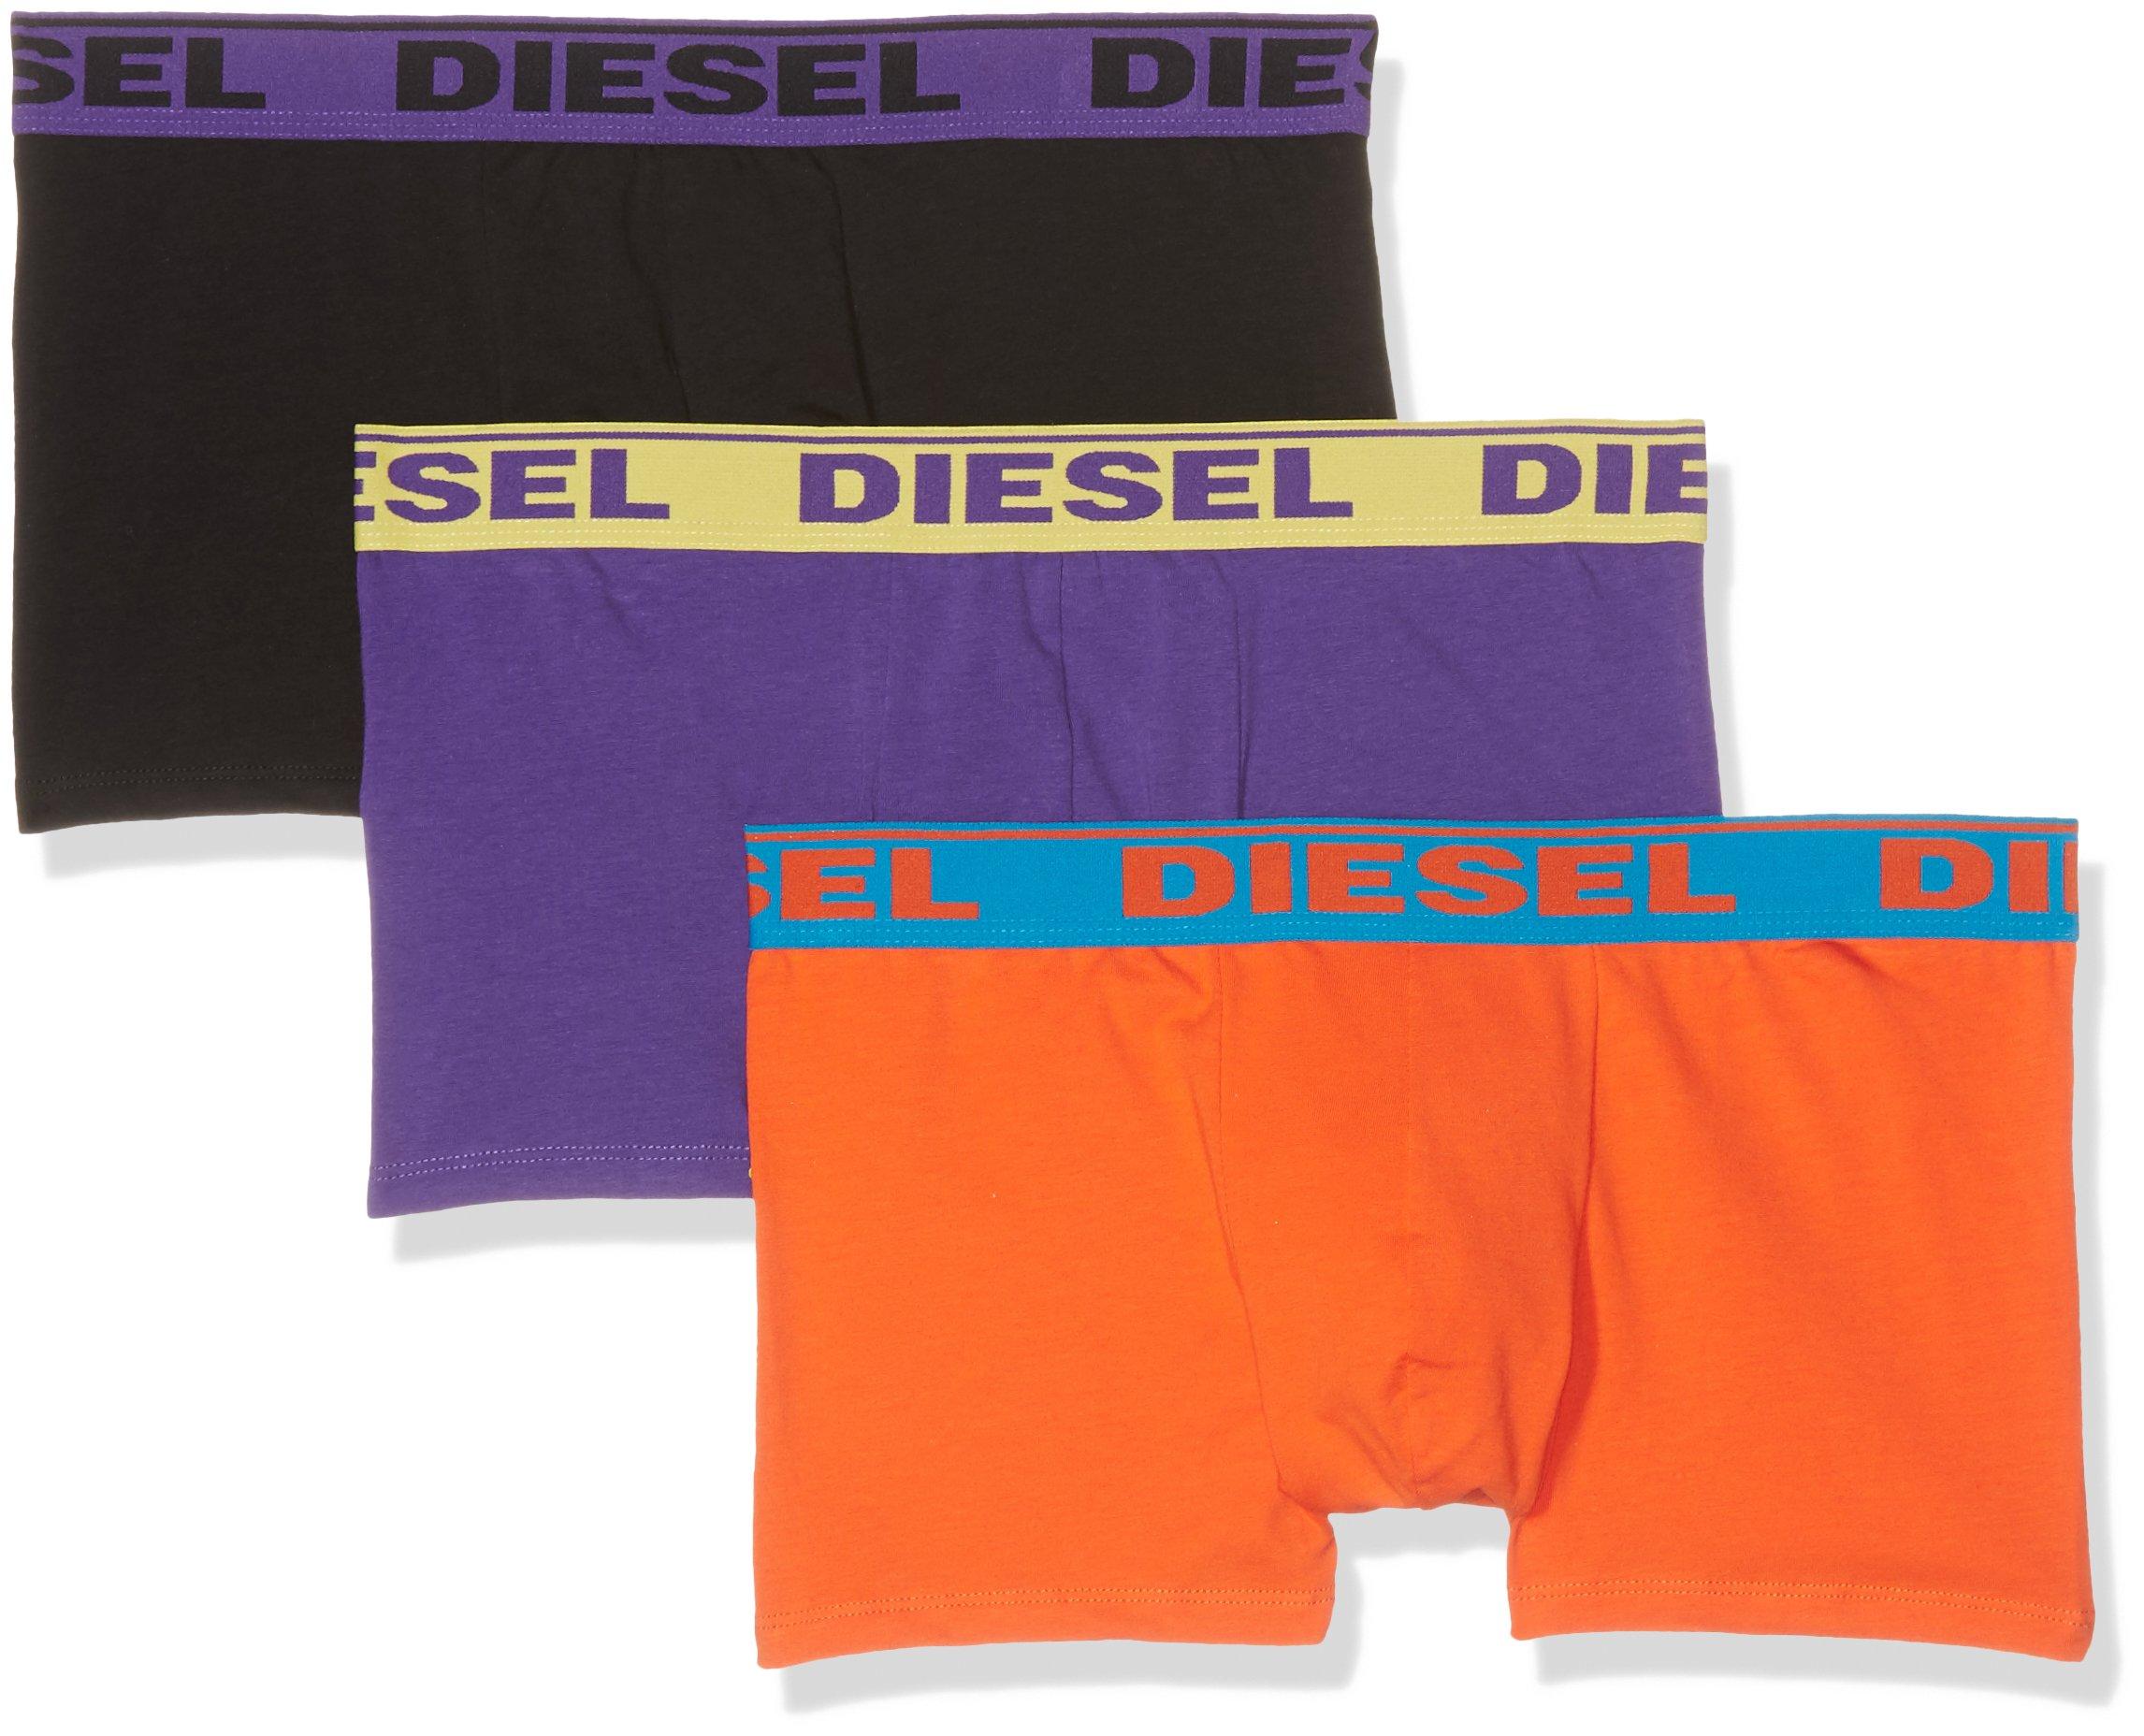 Diesel Men's 3-Pack Shawn Stretch Boxer Trunk, Purple/Orange/Black, Medium